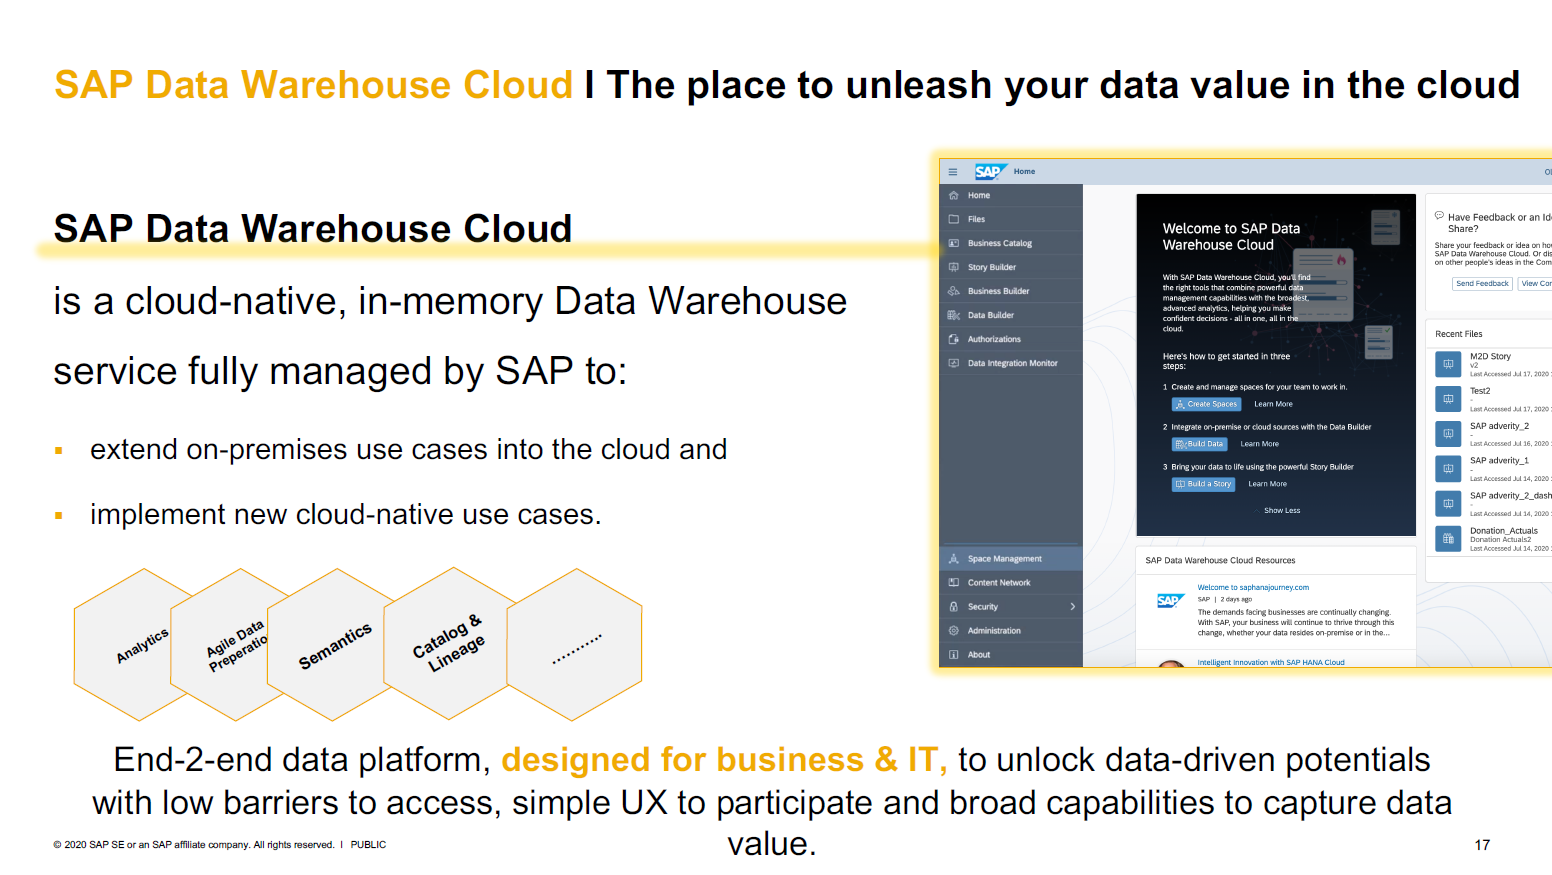 SAP Data Warehouse Cloud im Kern